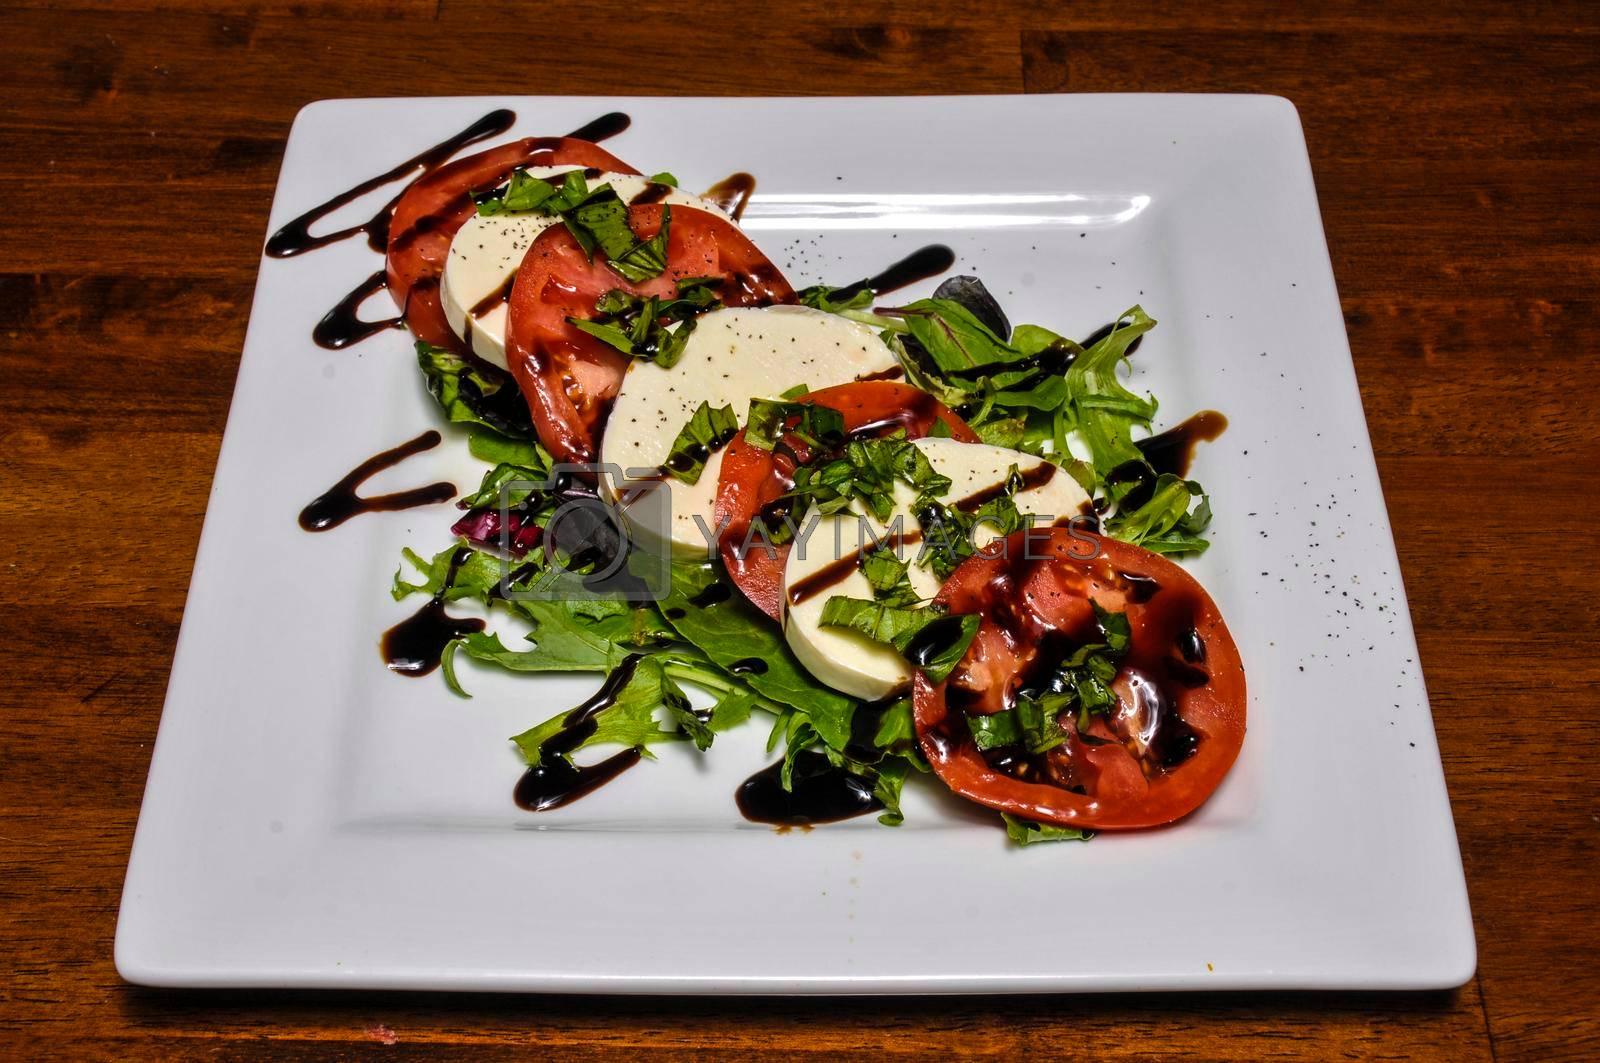 Delicious Mediterranean dish known as the caprese salad